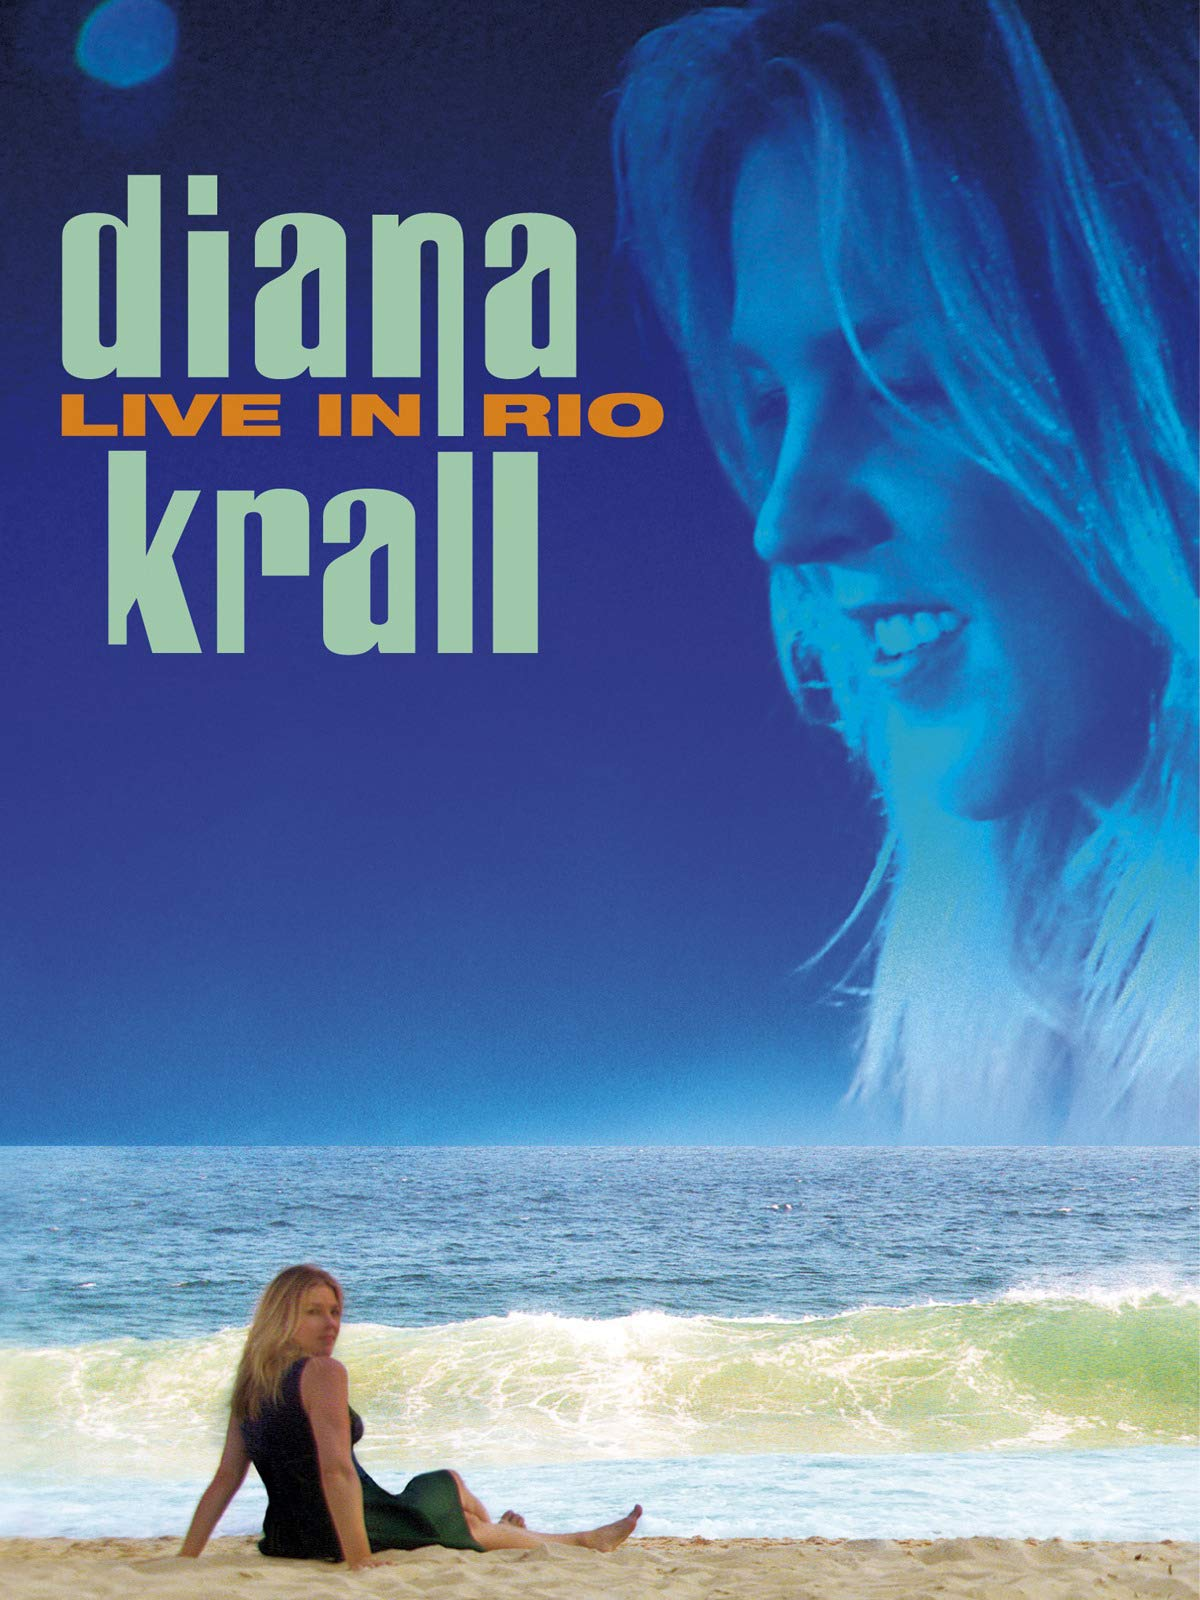 Diana Krall - Live In Rio on Amazon Prime Video UK